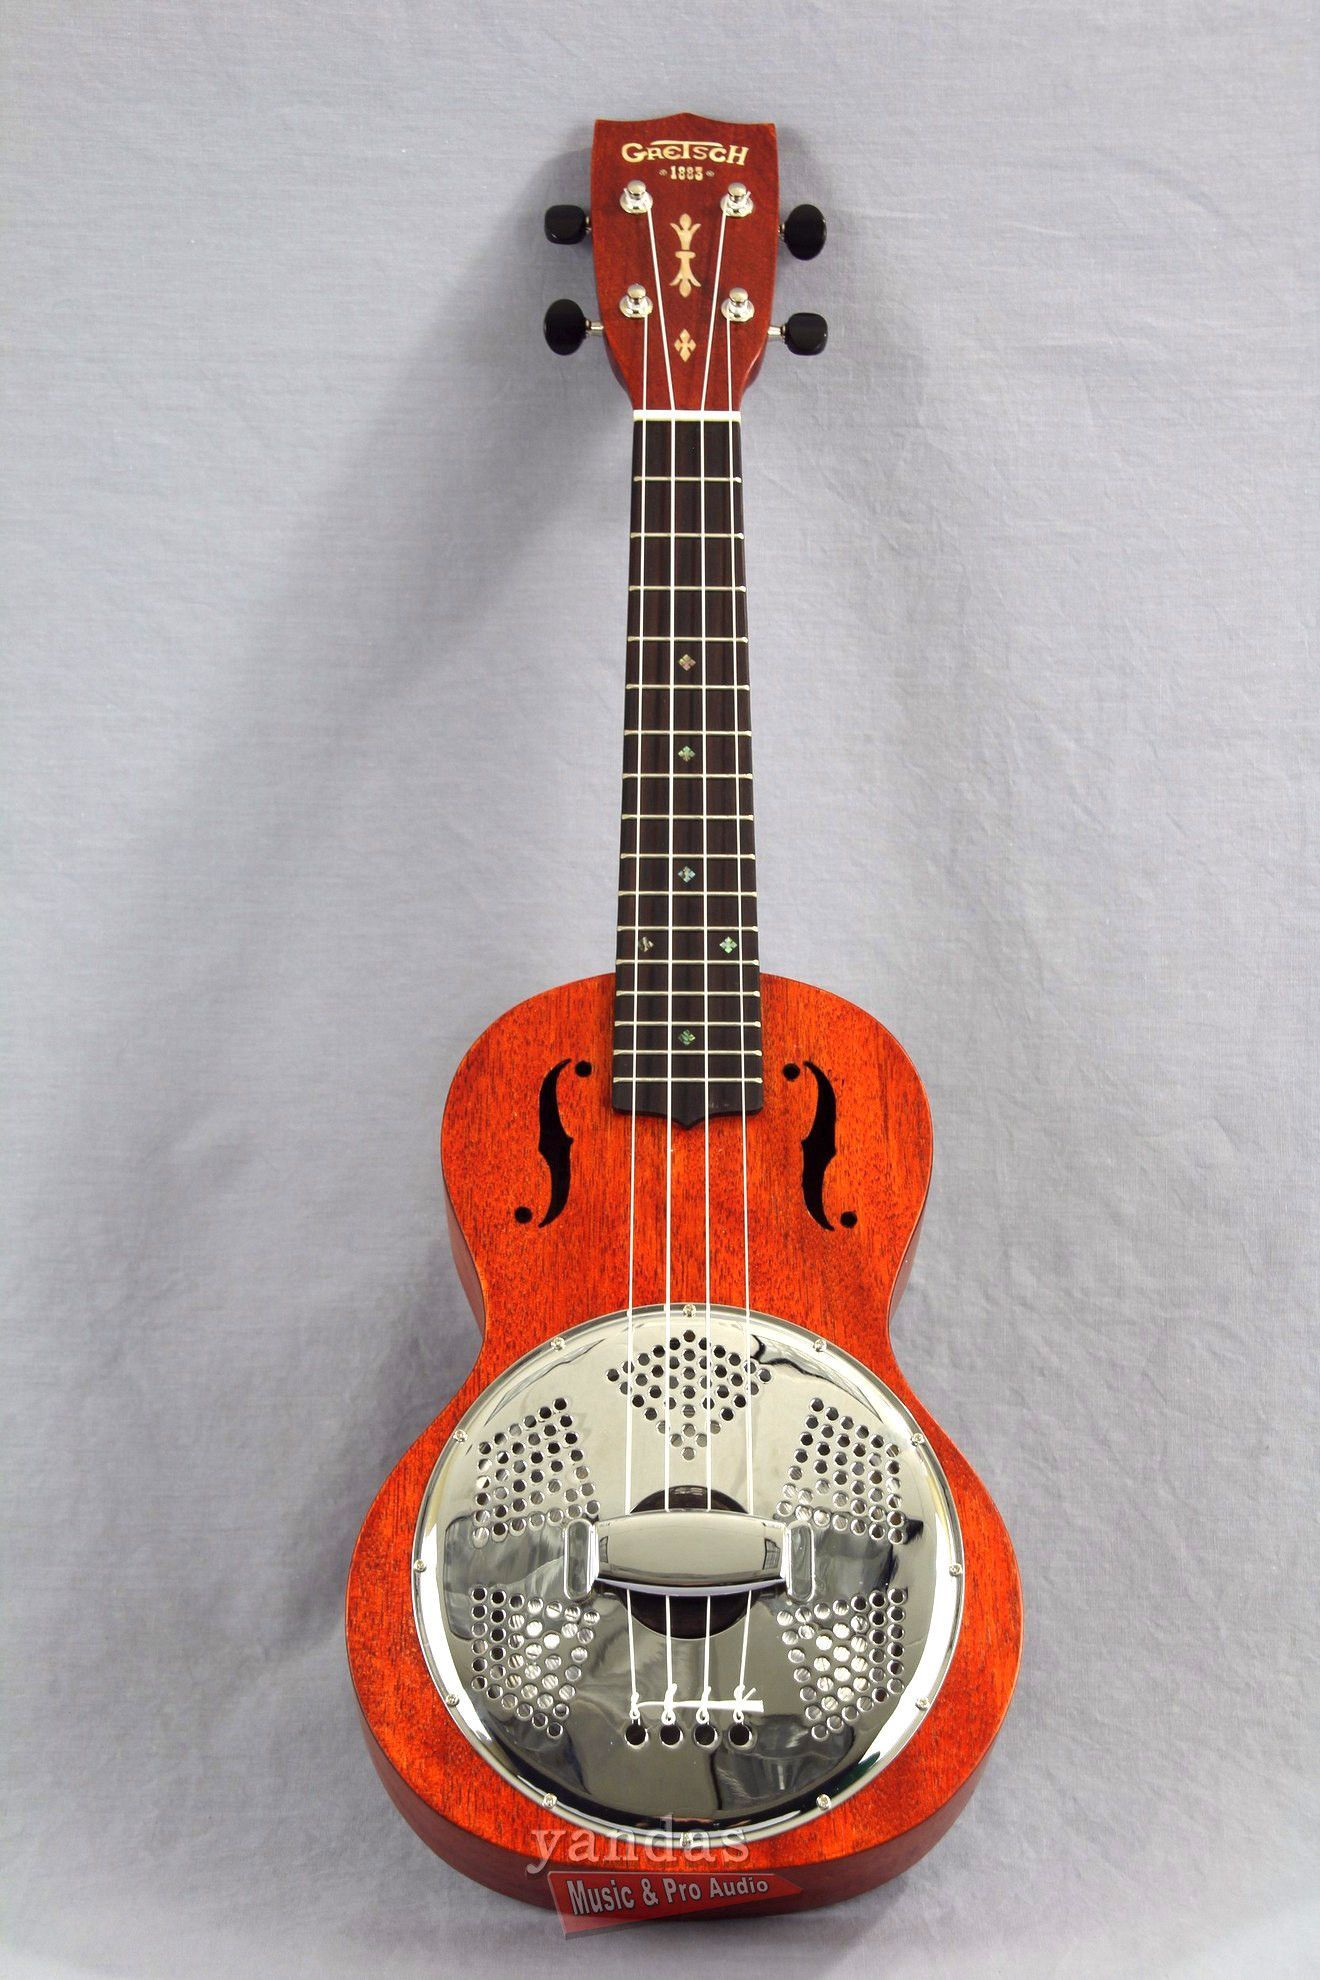 The Gretsch G9112 Resonator ukulele packs a powerful punch